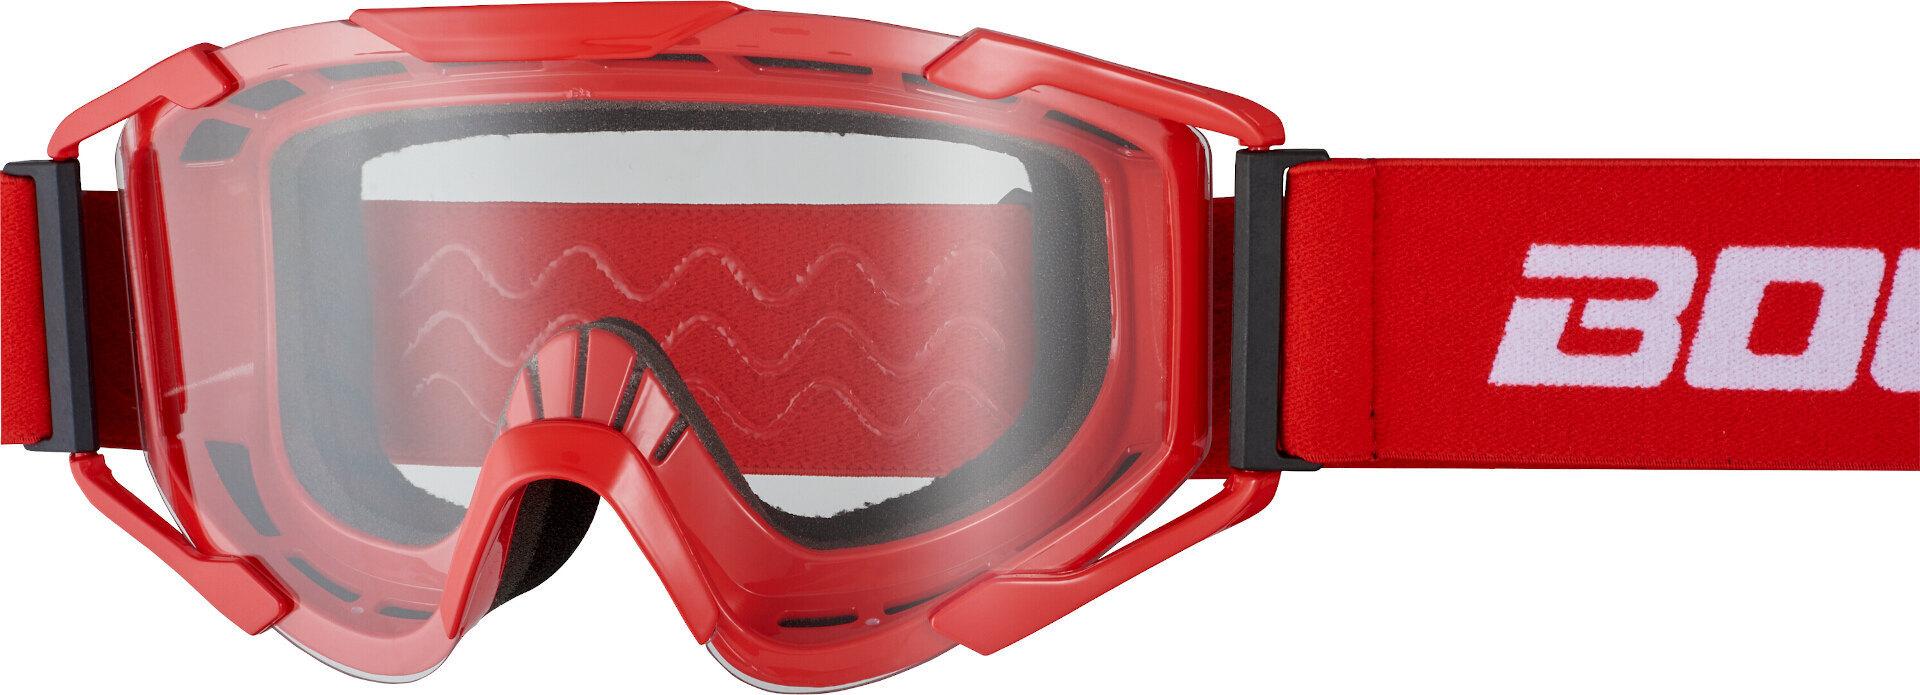 Bogotto B-ST Motocross Goggles